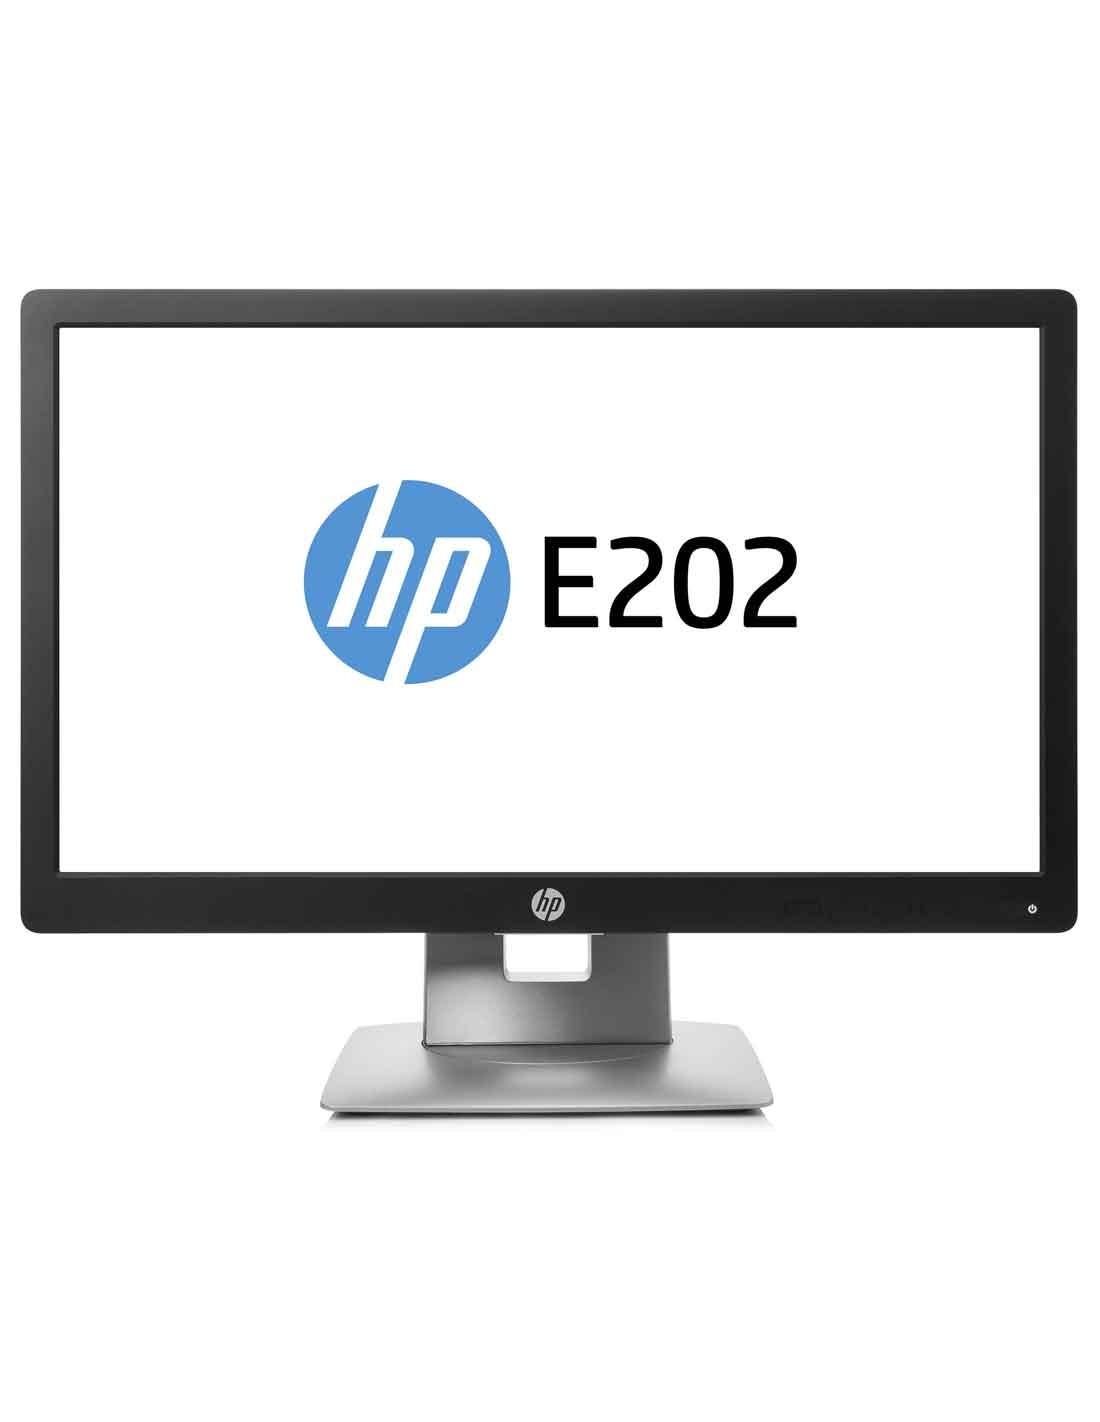 HP EliteDisplay E202 20-inch Monitor at the cheapest price in Dubai